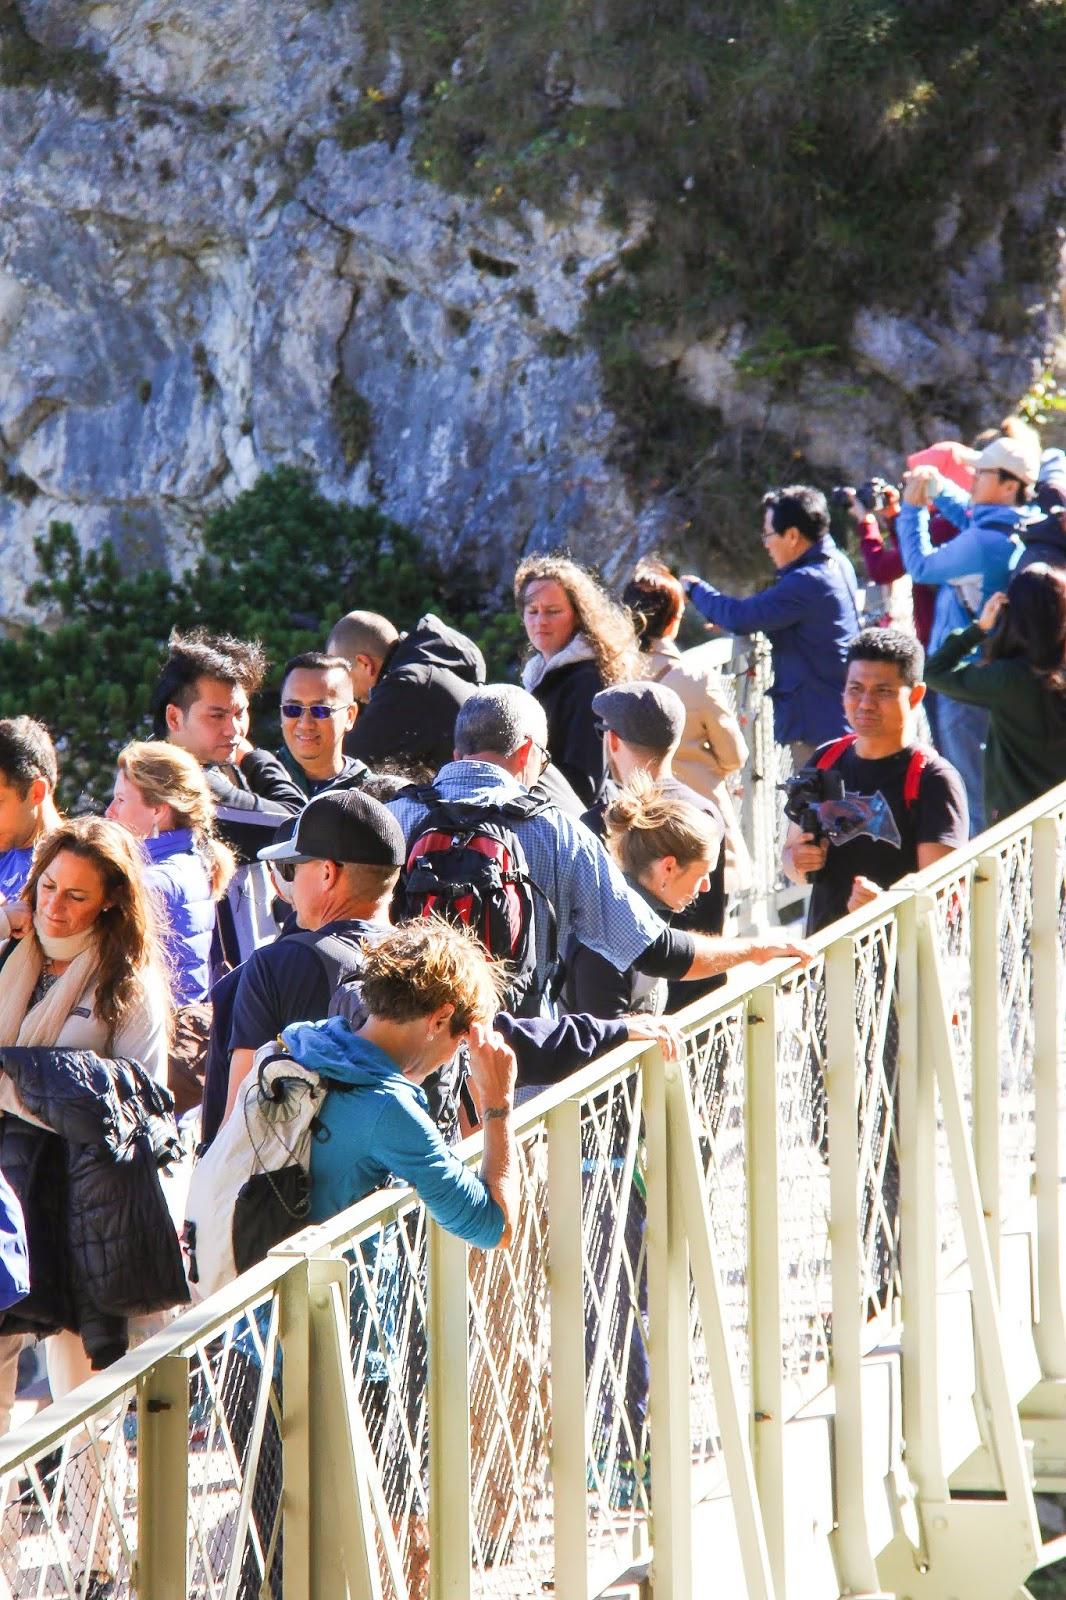 Musim Luruh Di Neuschwanstein Castle - Marienbrucke 3